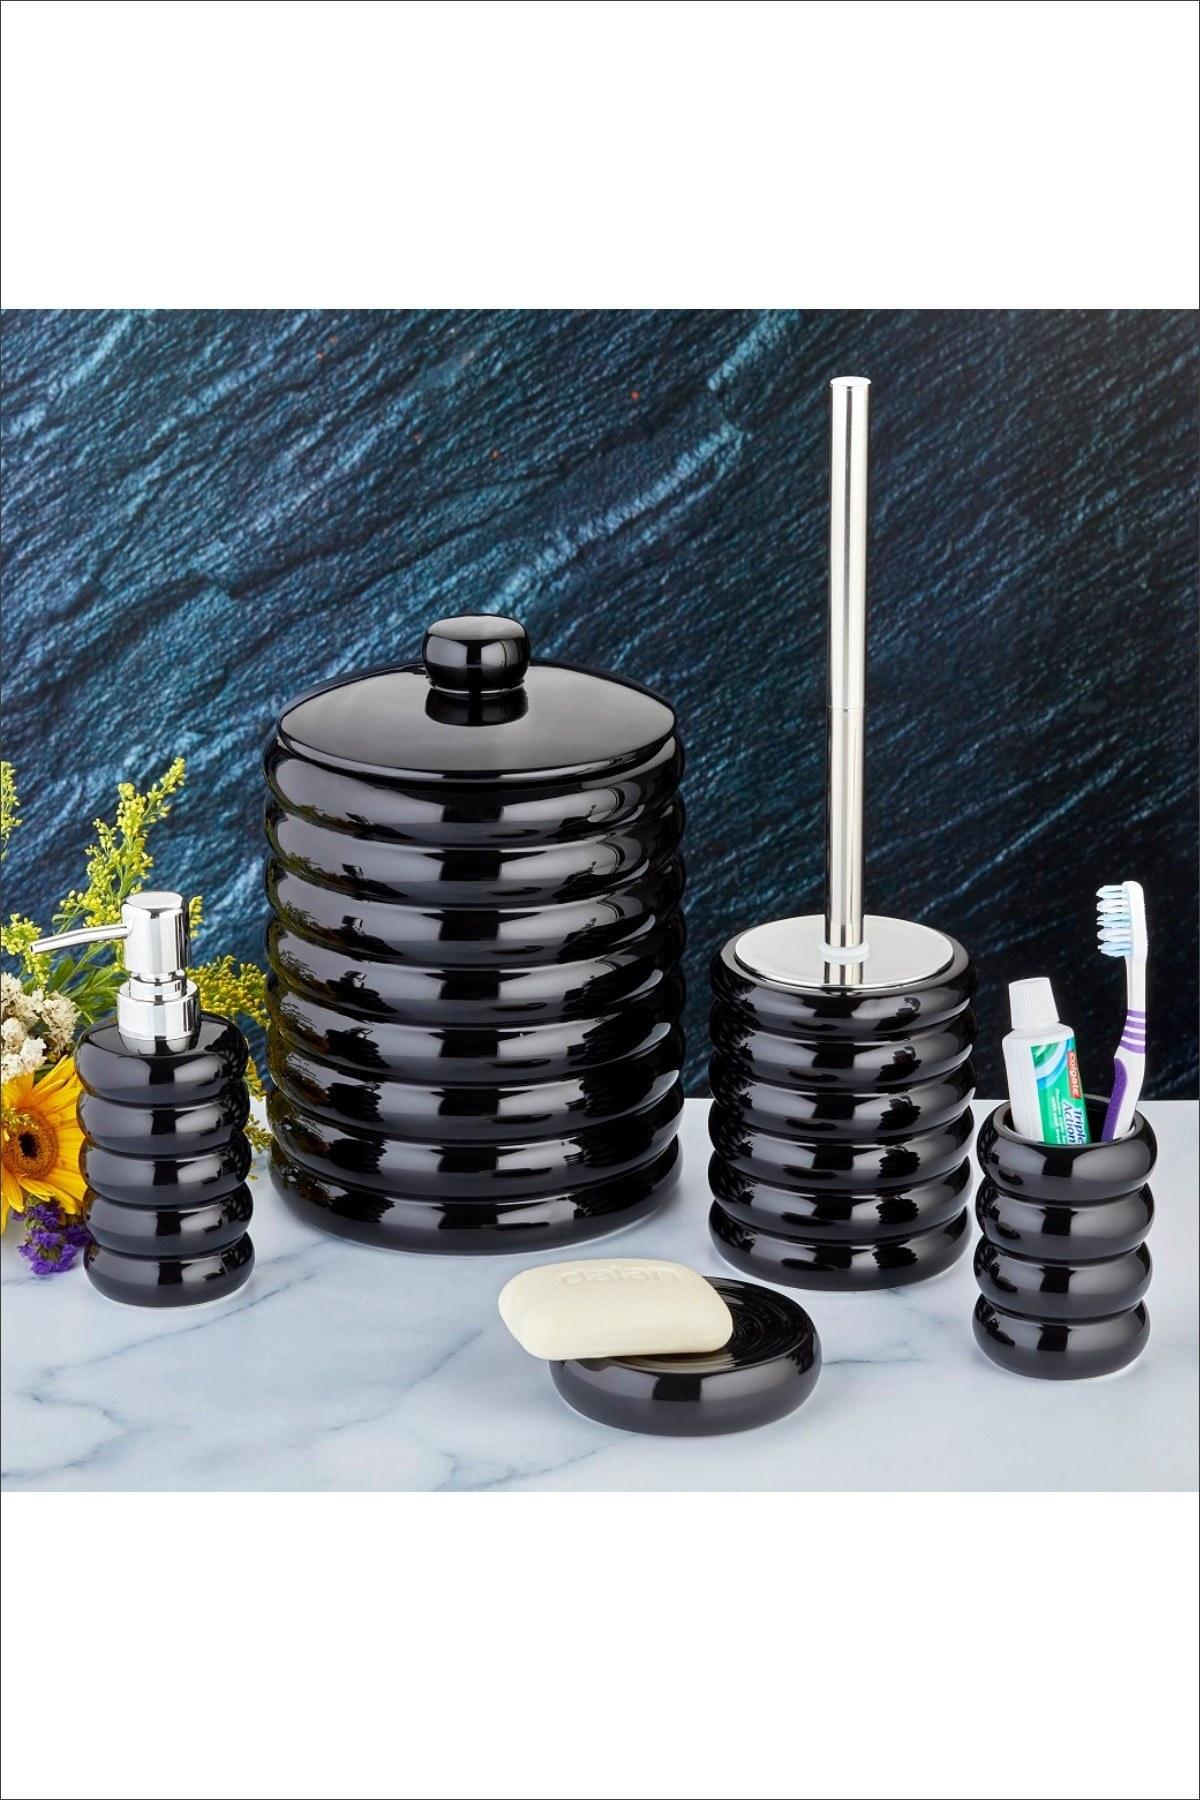 main images ست سرویس بهداشتی سرامیک 5تکه مشکی سطل زباله برند Pinkev کد 1598945037